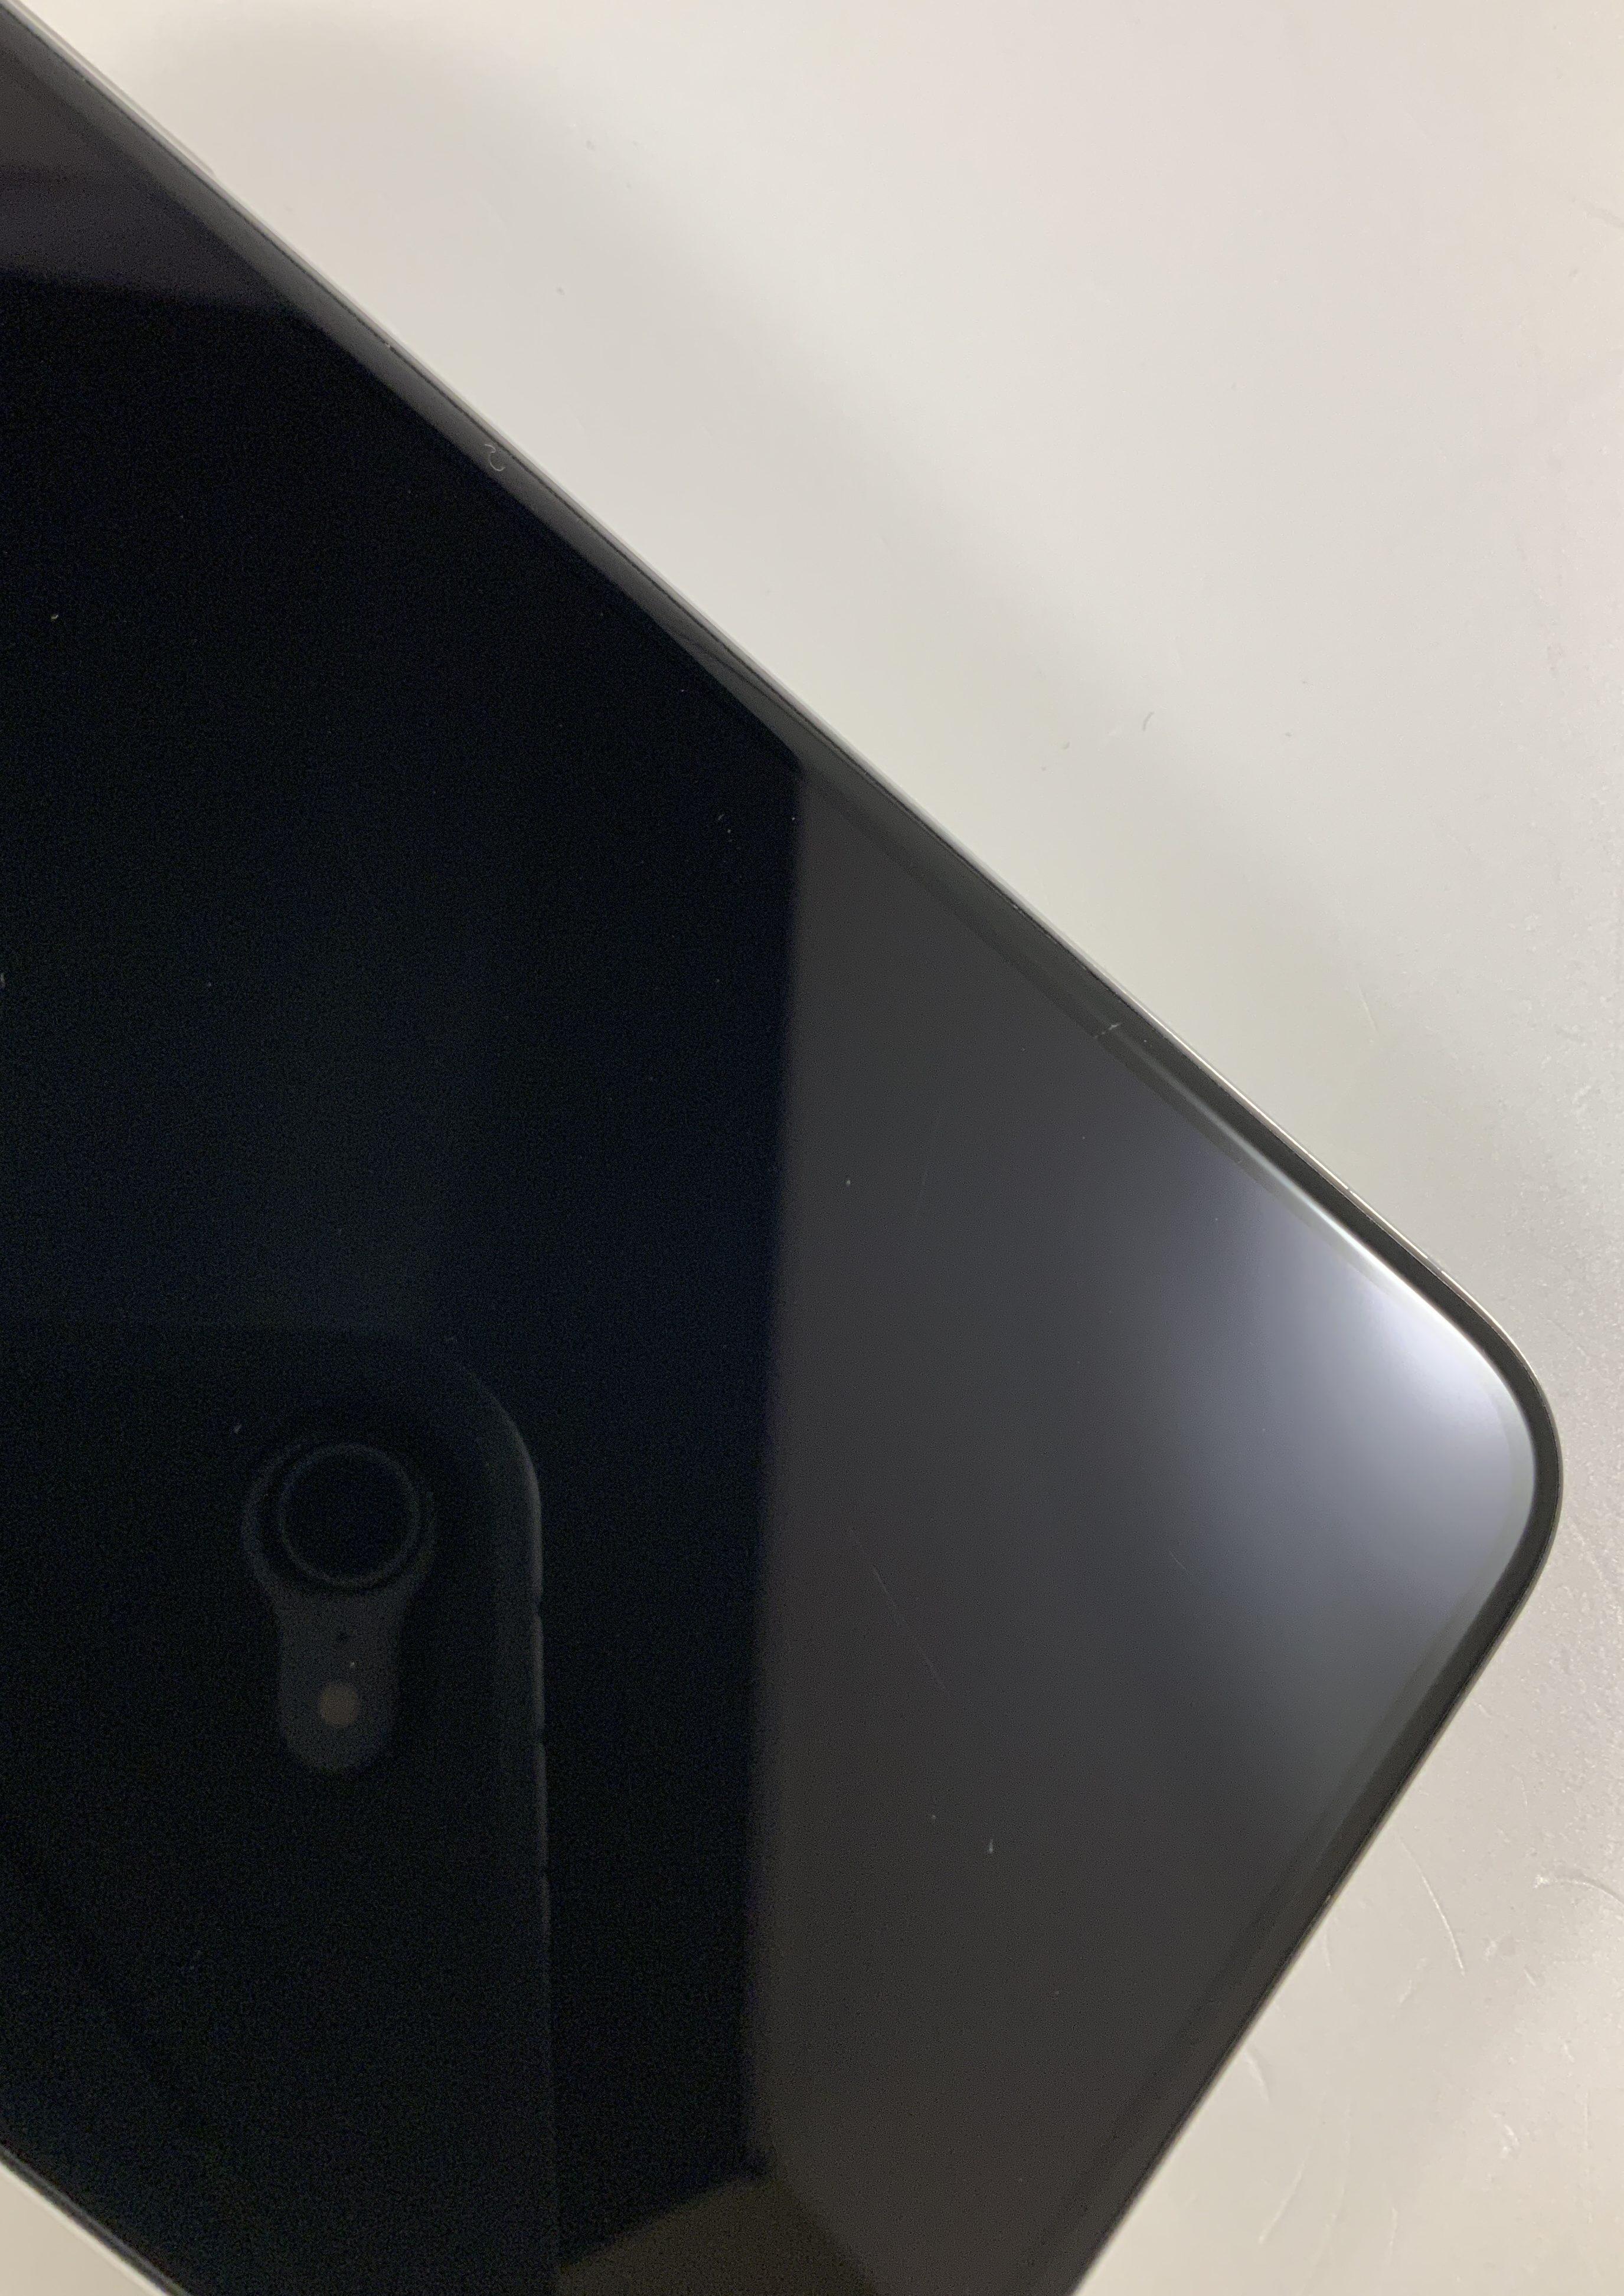 iPhone XS 64GB, 64GB, Silver, Bild 4